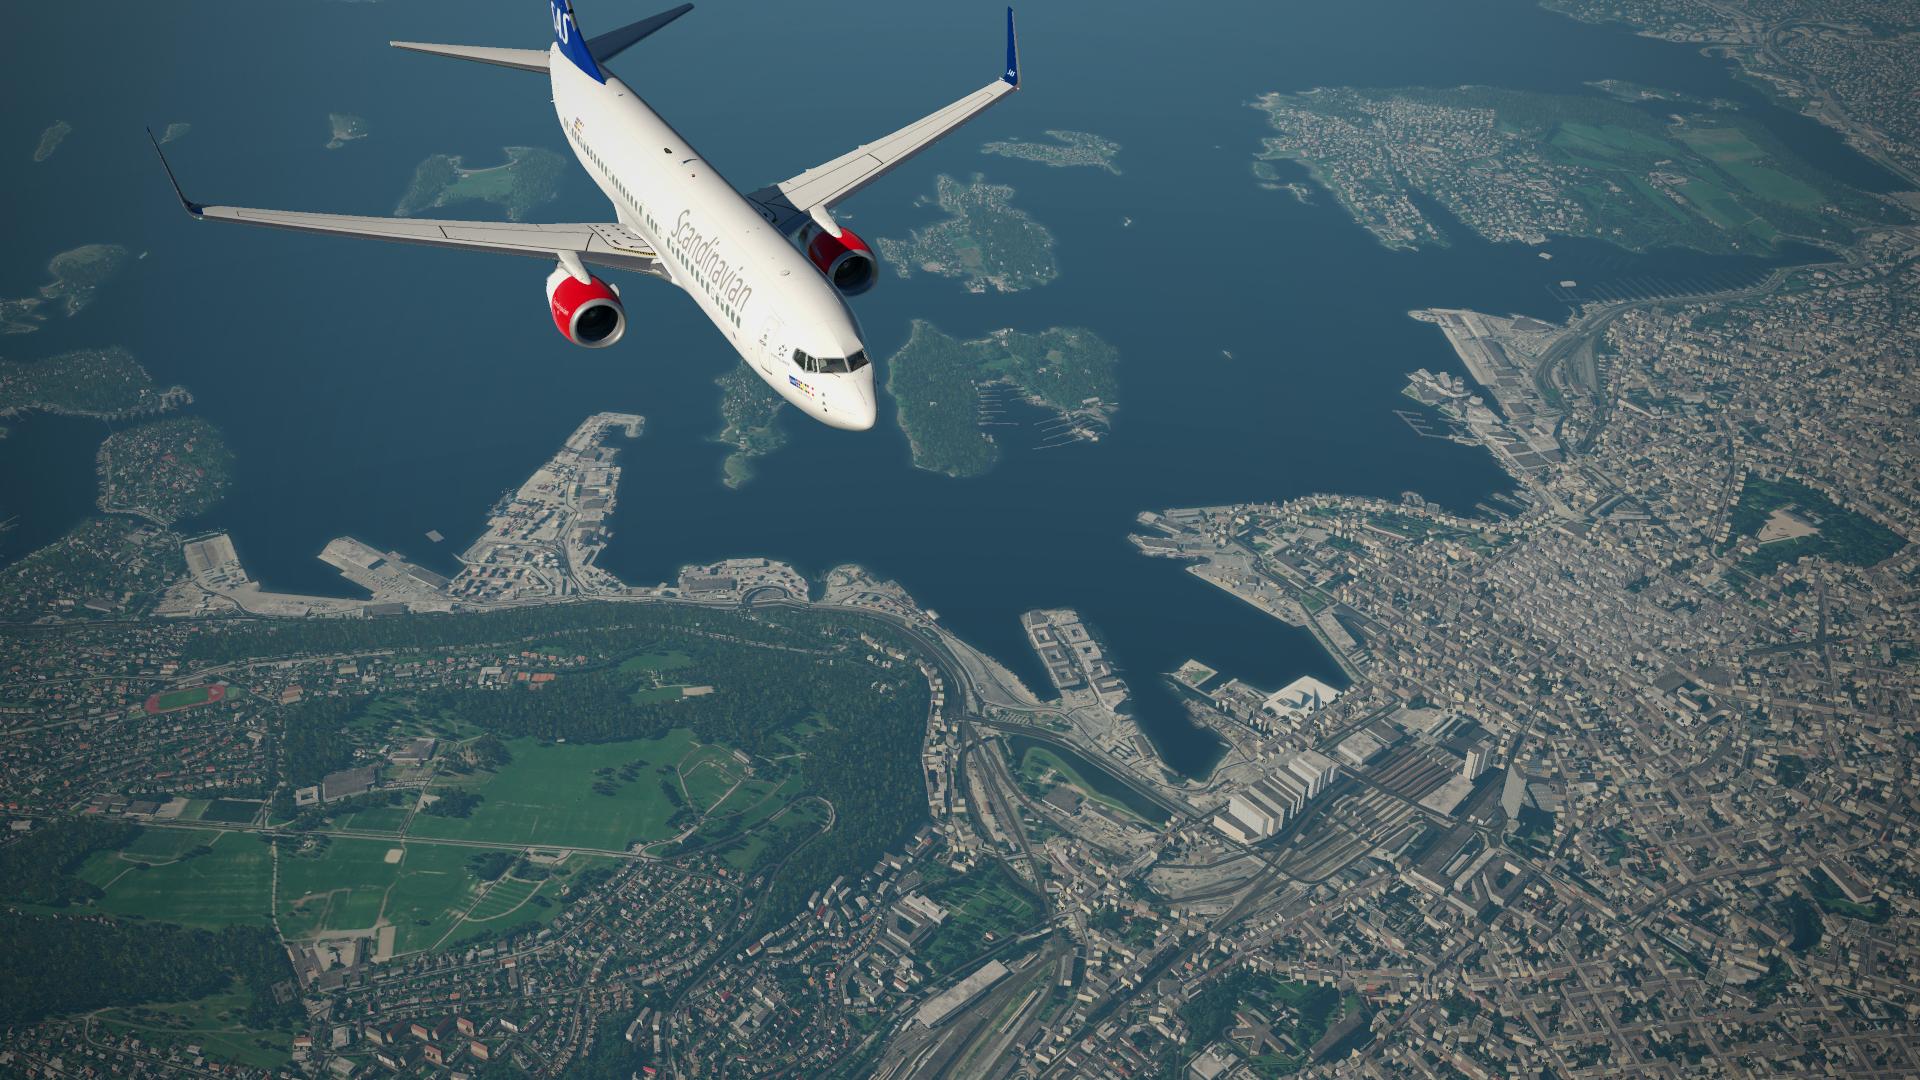 FsAviX - X-Plane Org Forum